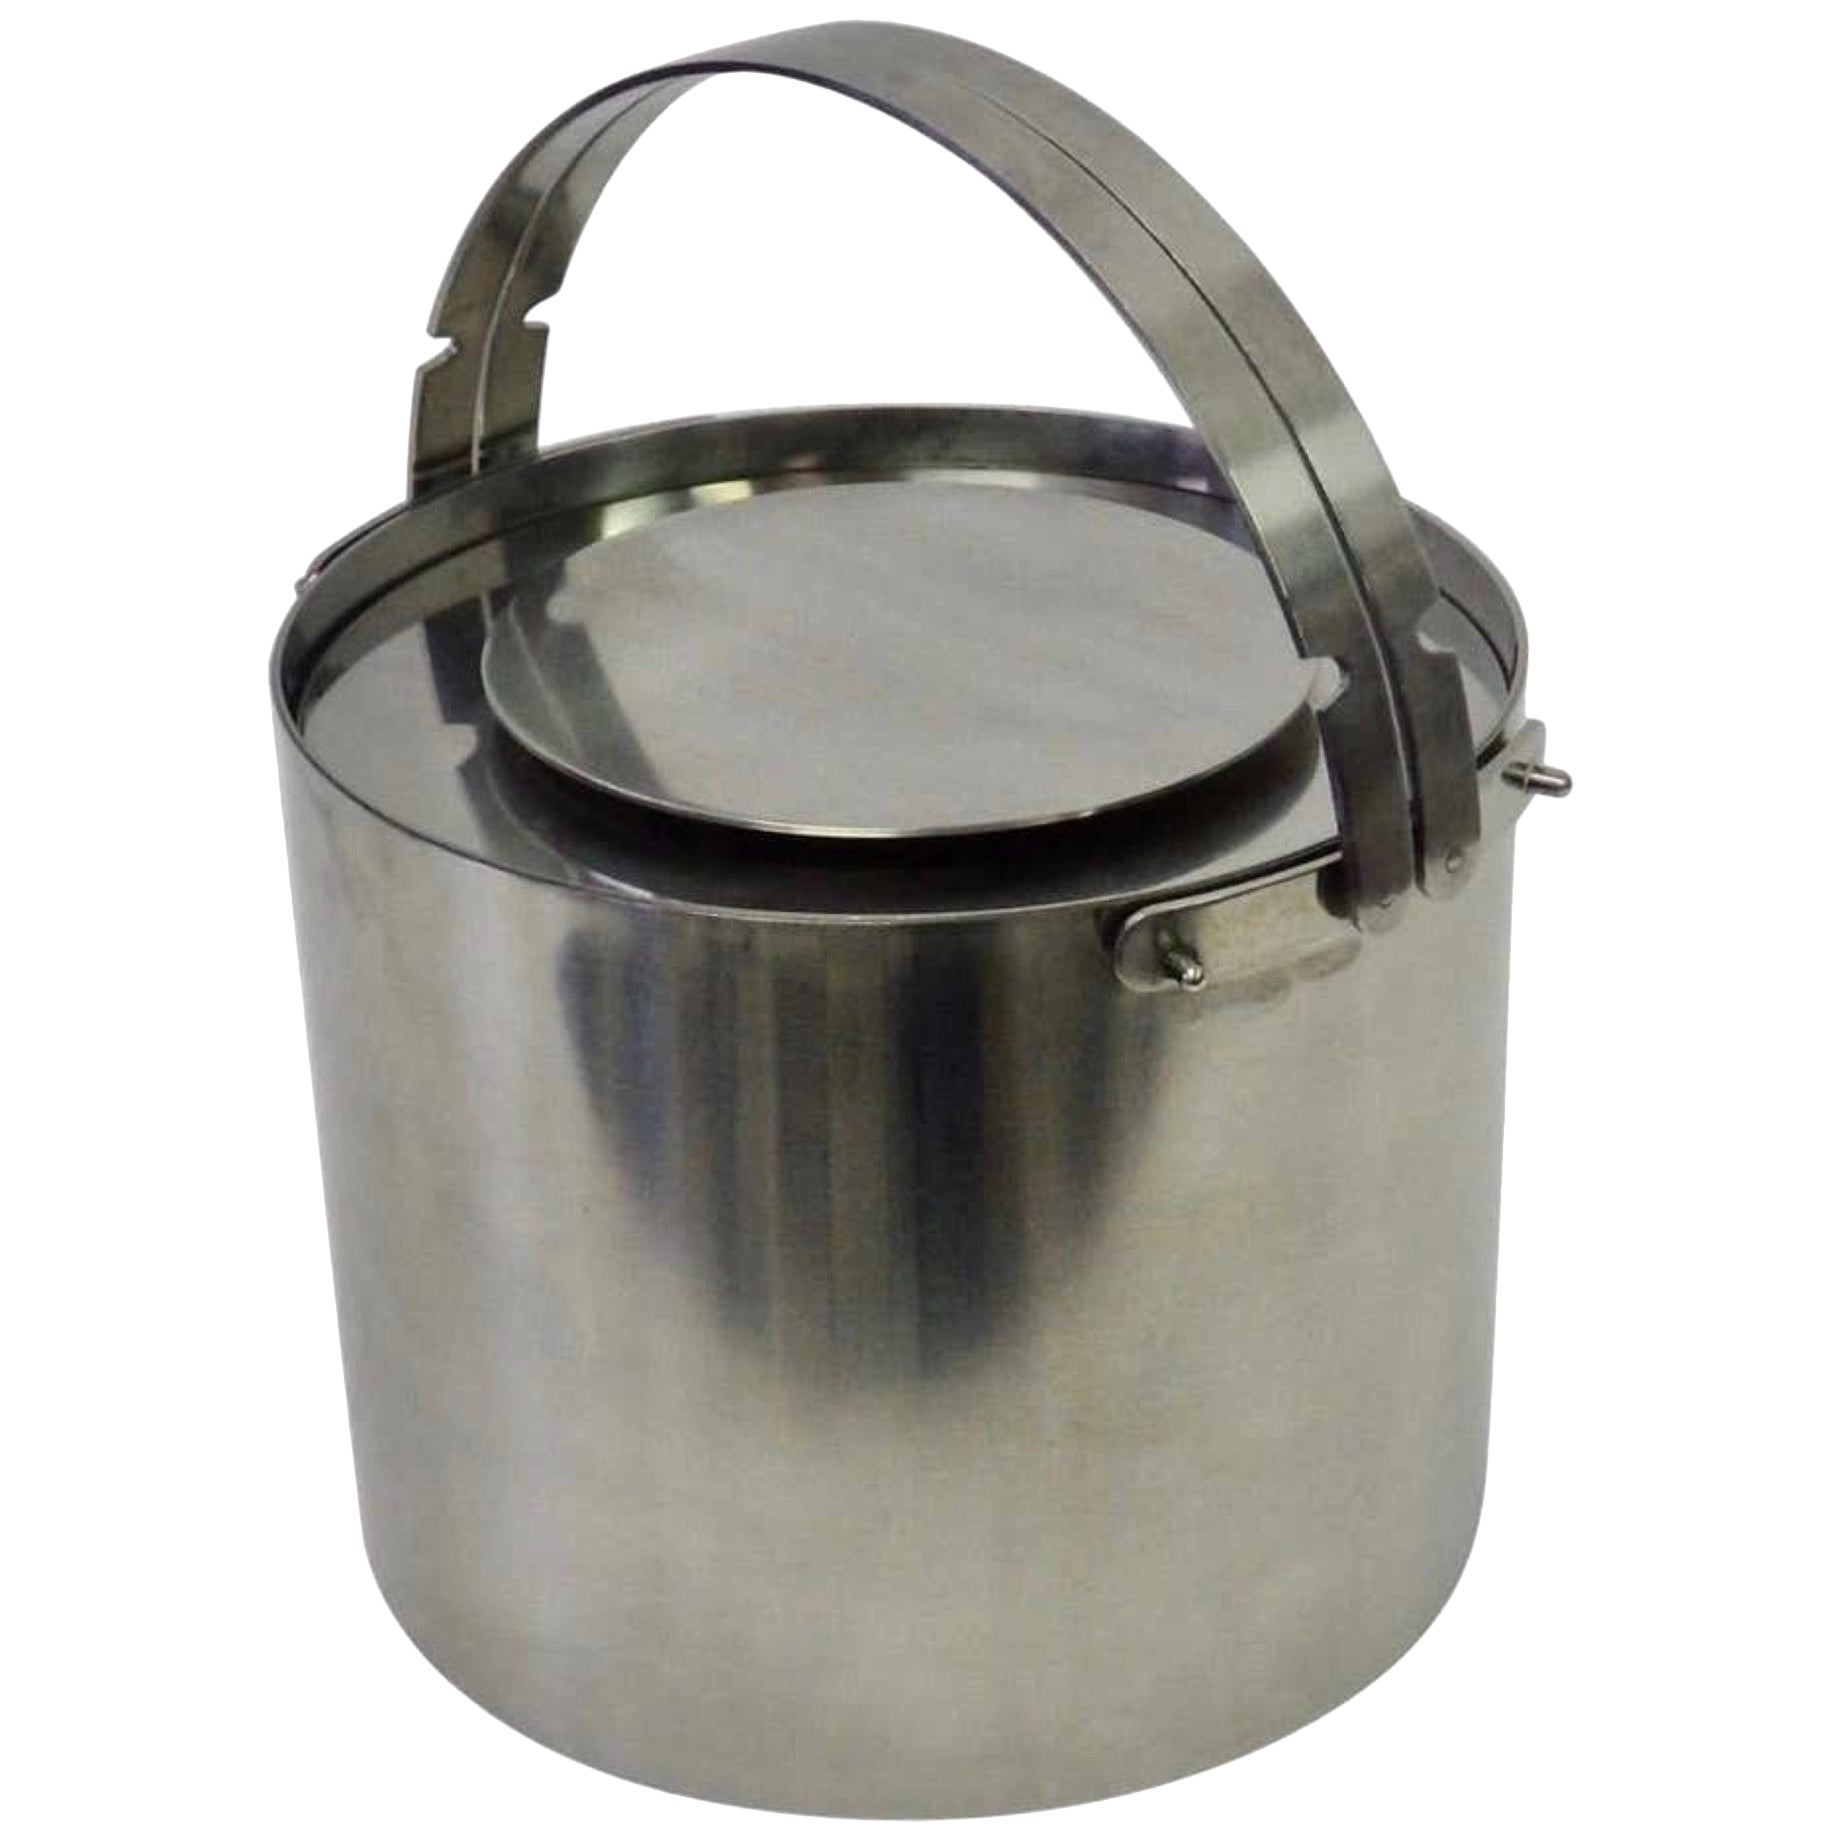 Arne Jacobsen Cylinda Series Stainless Steel Ice Bucket